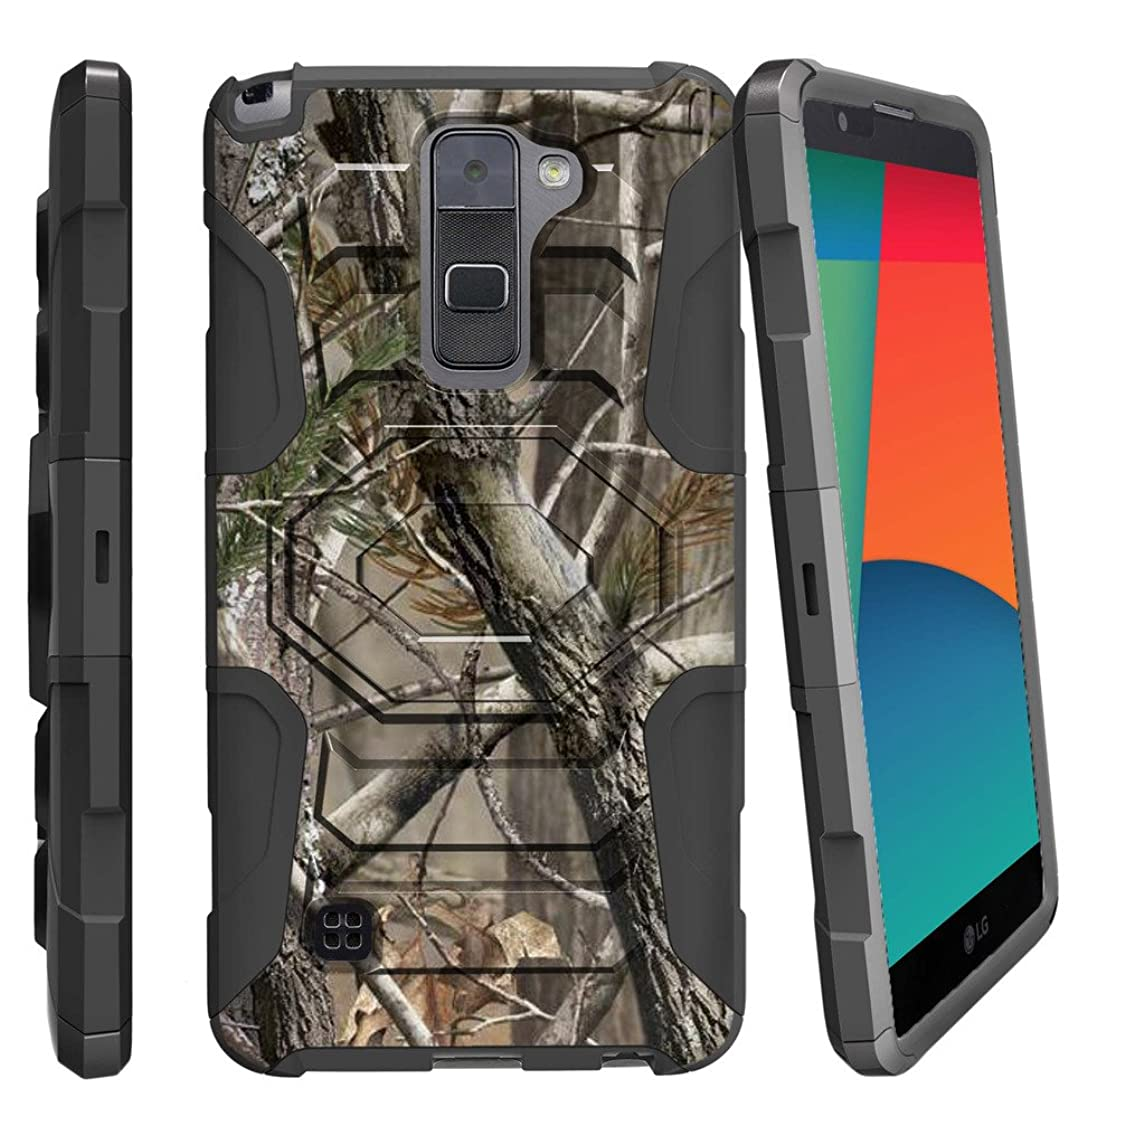 MINITURTLE Case Compatible w/ LG Stylo 2 |LG Stylus 2 Case,[Armor Reloaded] Dual Layer Shell Rugged Belt Clip Case Graphic Images [L82VL L81VL K540 K520] Nature's Camouflage